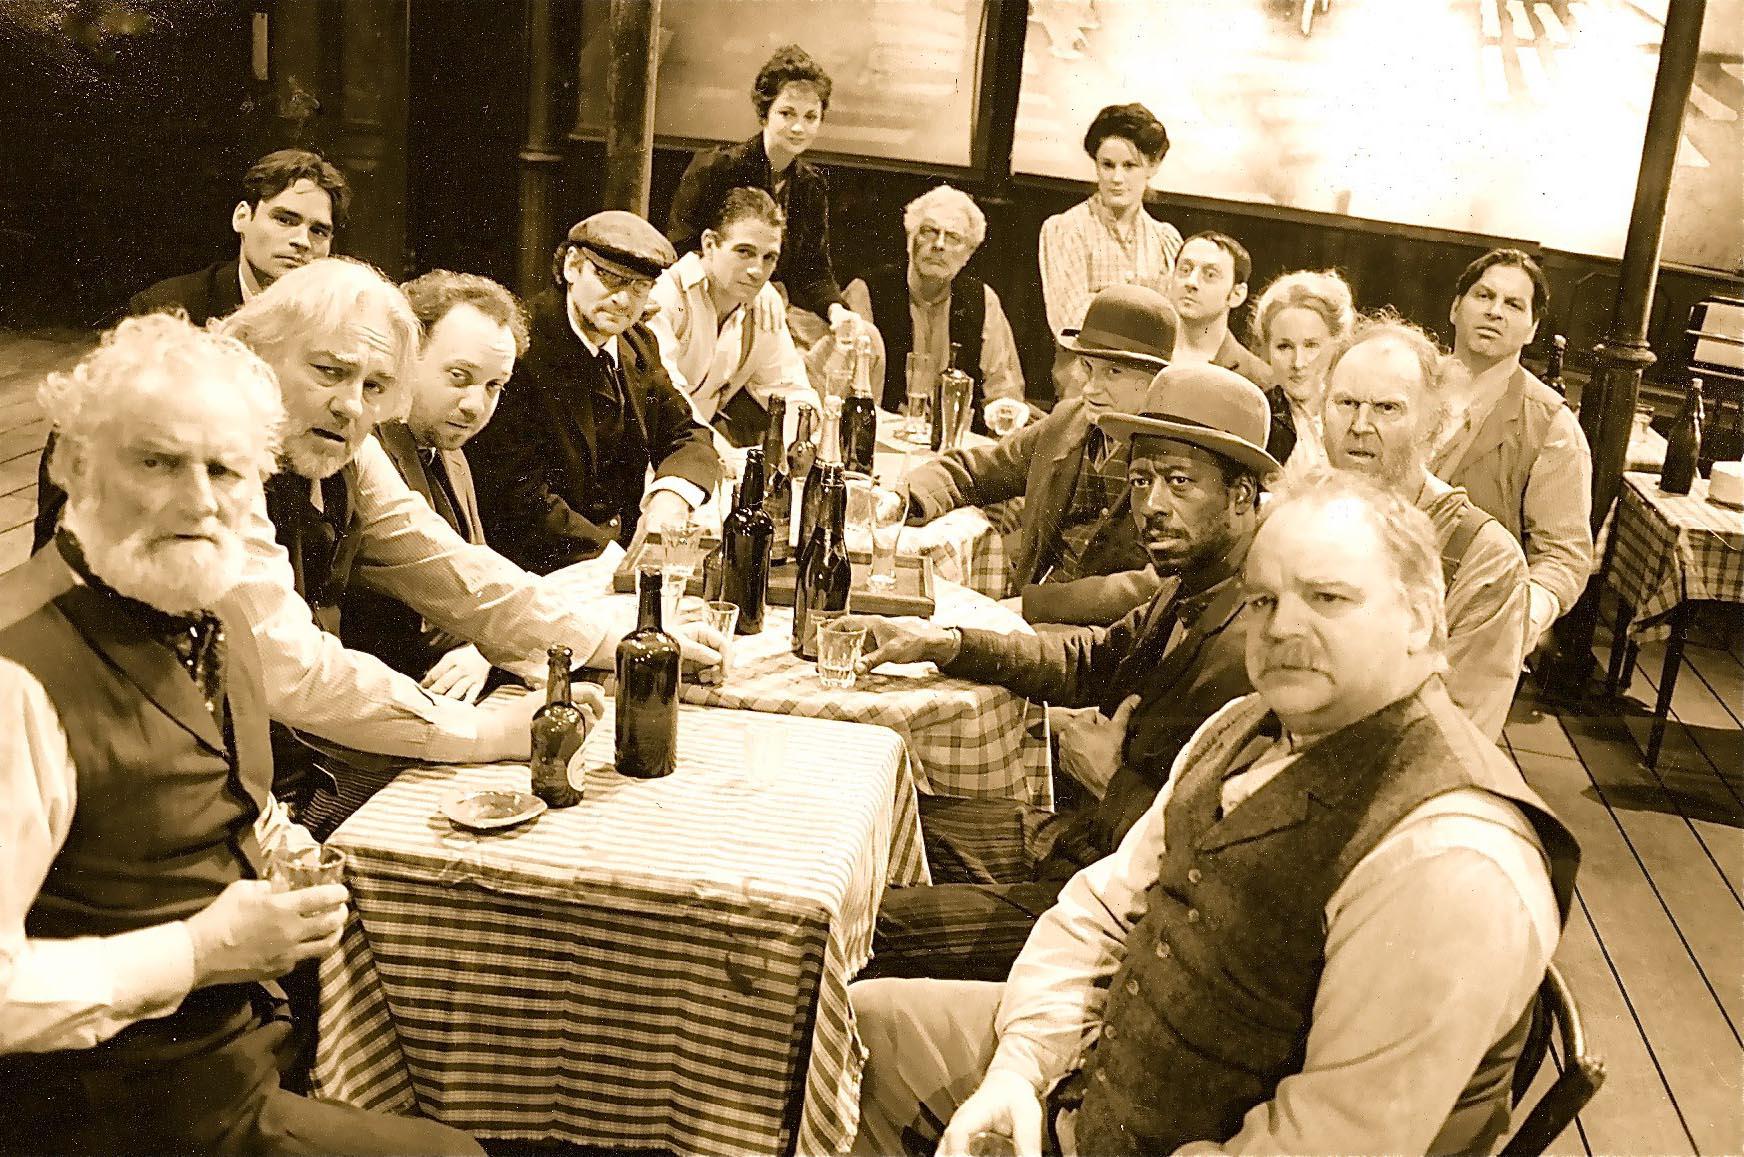 As Hugo in THE ICEMAN COMETH on Broadway, with Paul Giamatti, Tony Danza, and Robert Sean Leonard and Tim Pigott-Smith